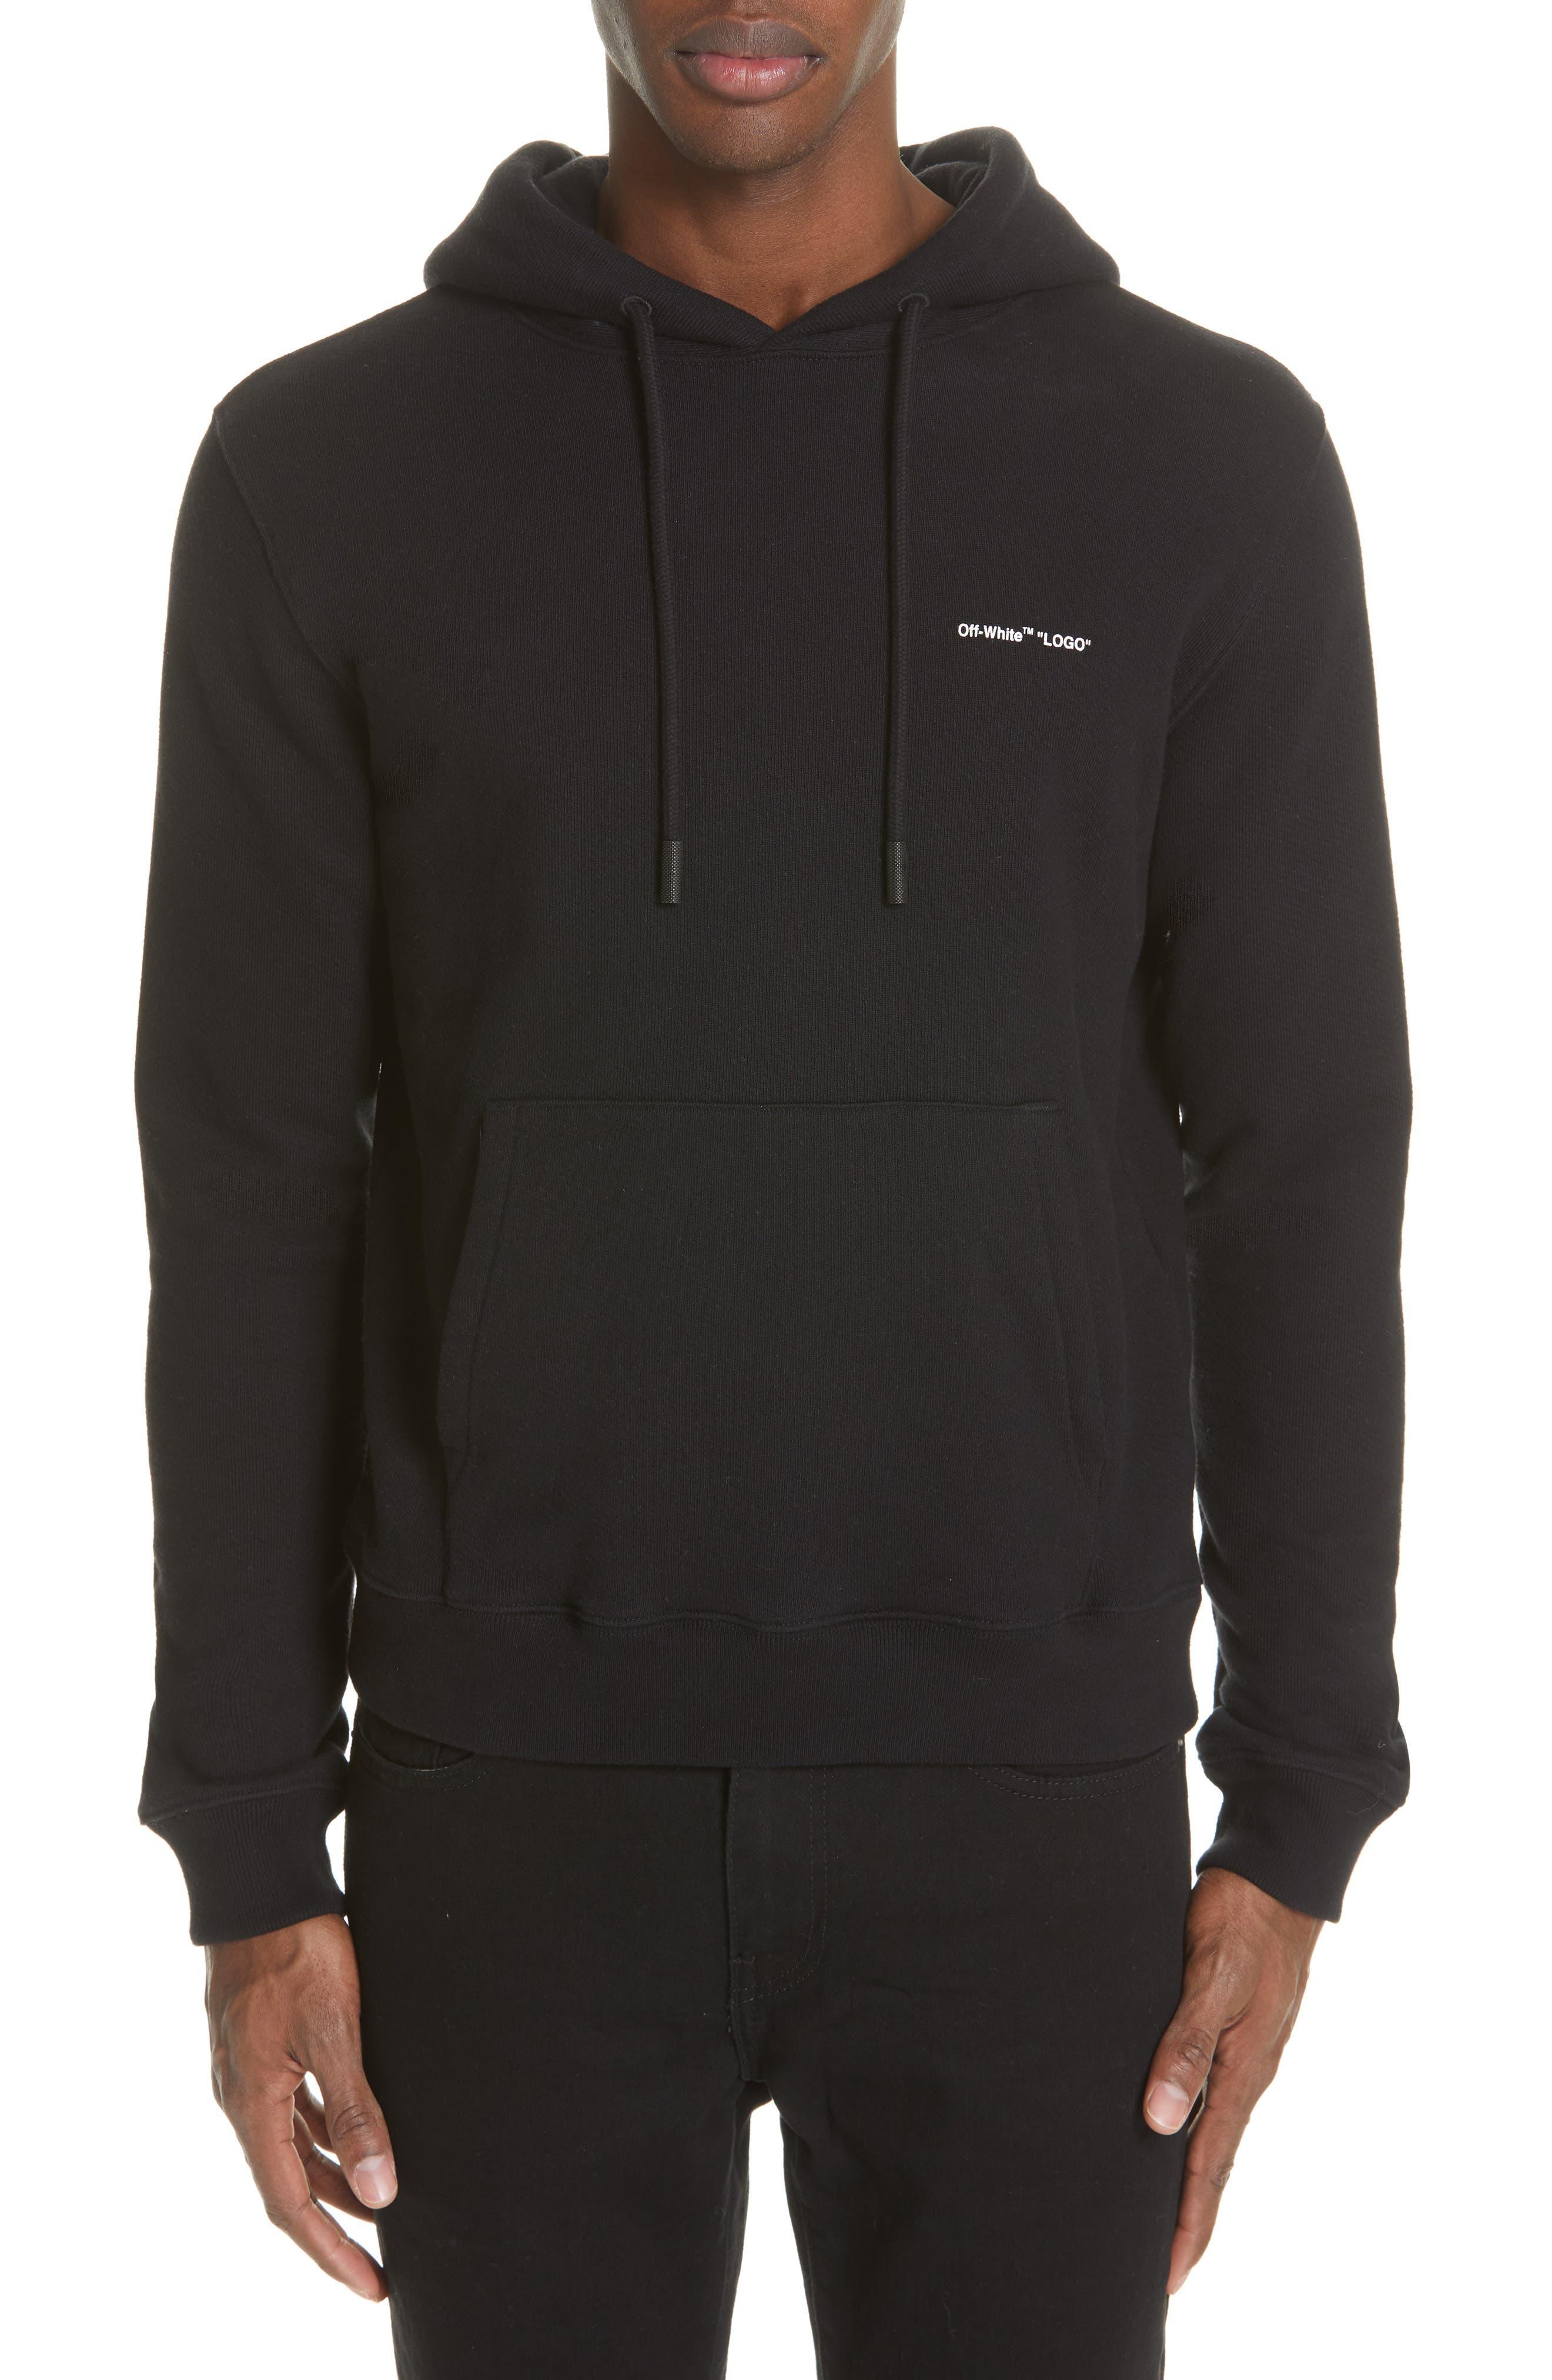 OFF-WHITE Slim Fit Logo Hoodie, Main, color, BLACK